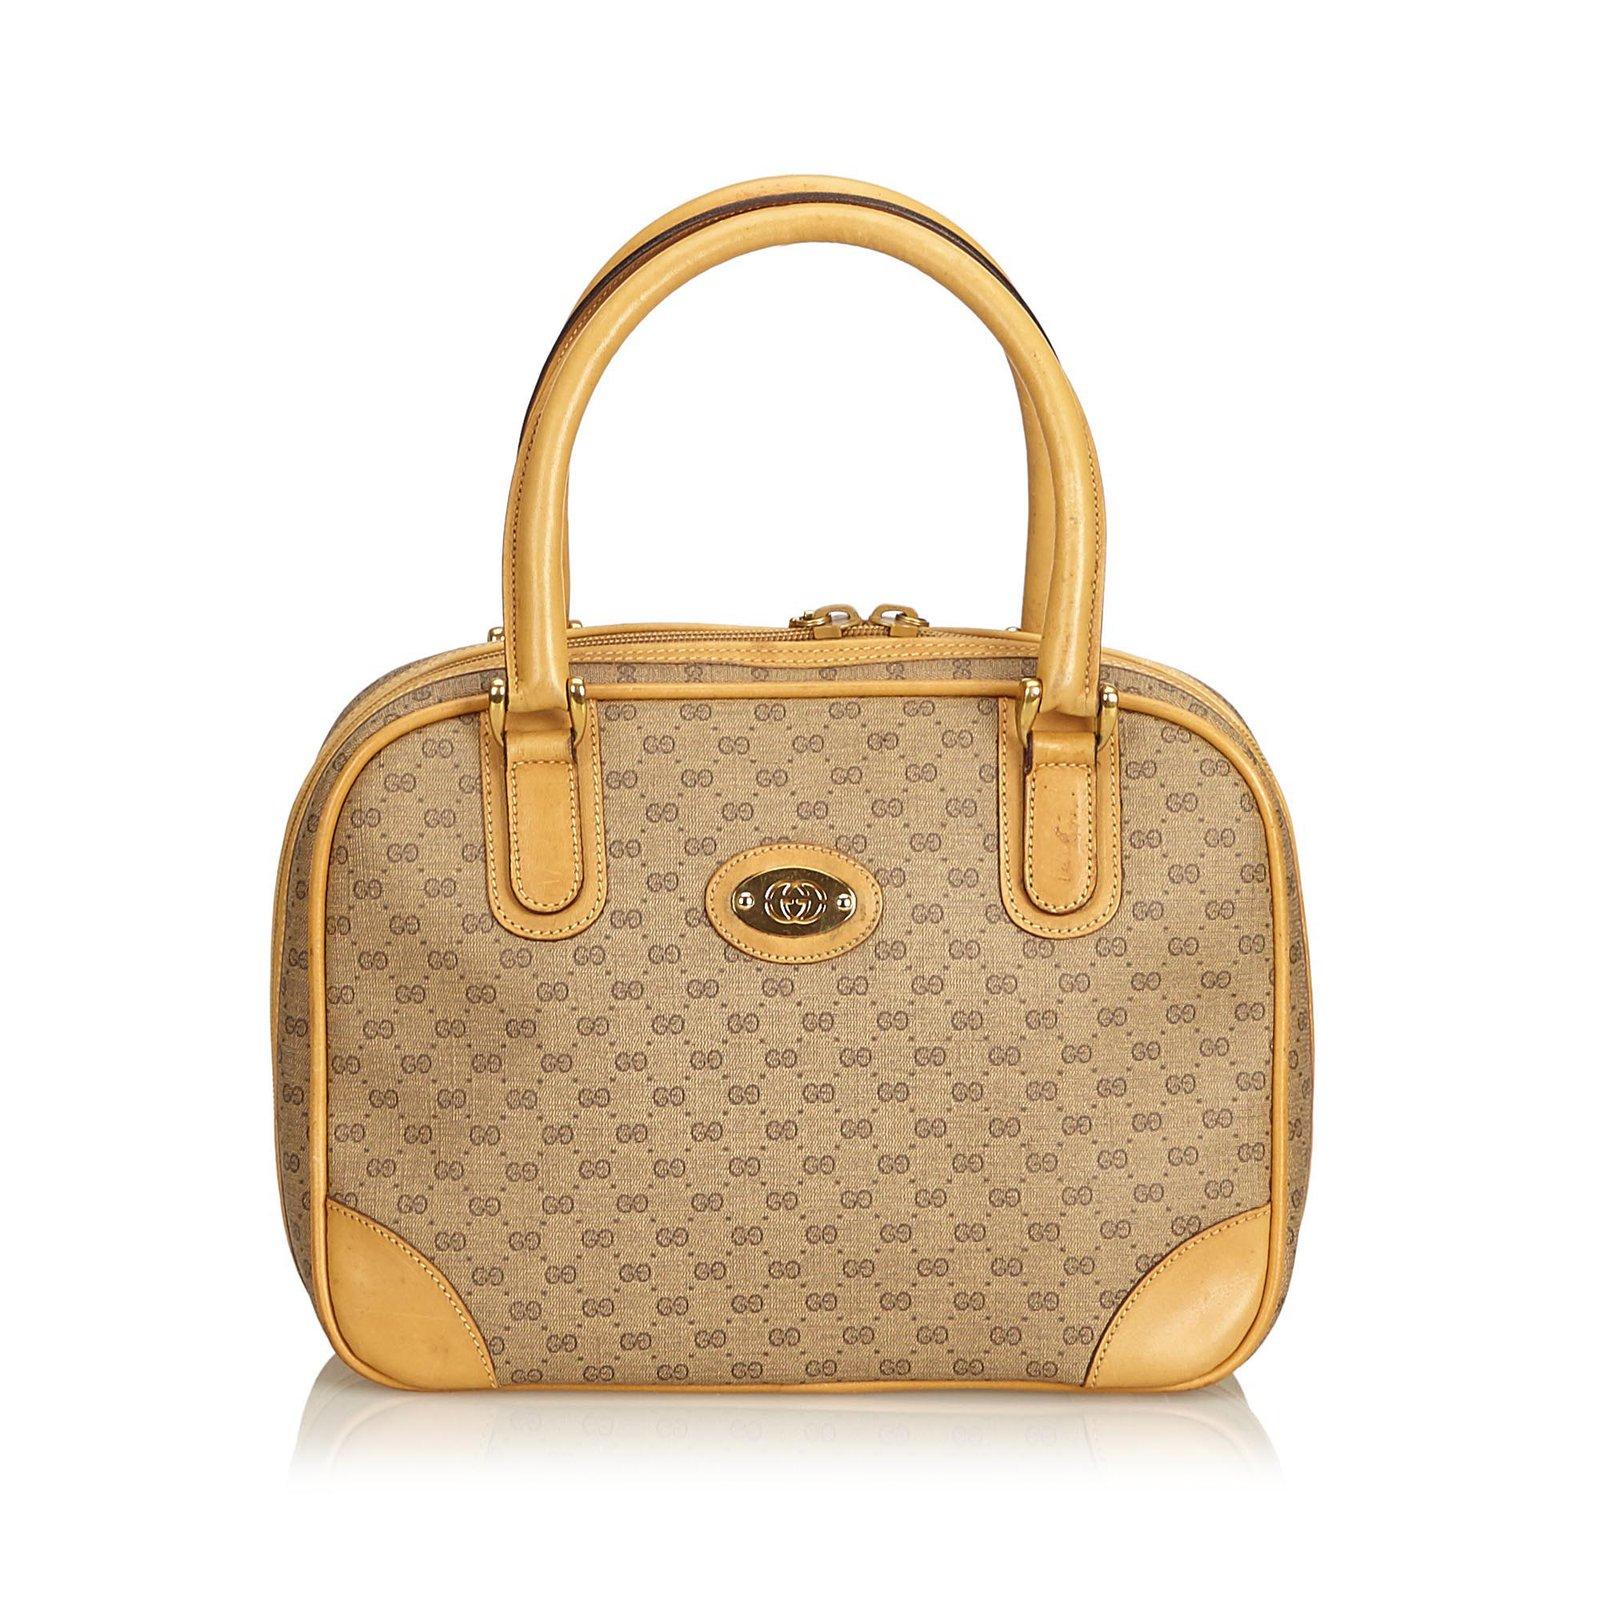 4048b0cecf8 Gucci Old Canvas Handbag Handbags Leather Other Cloth